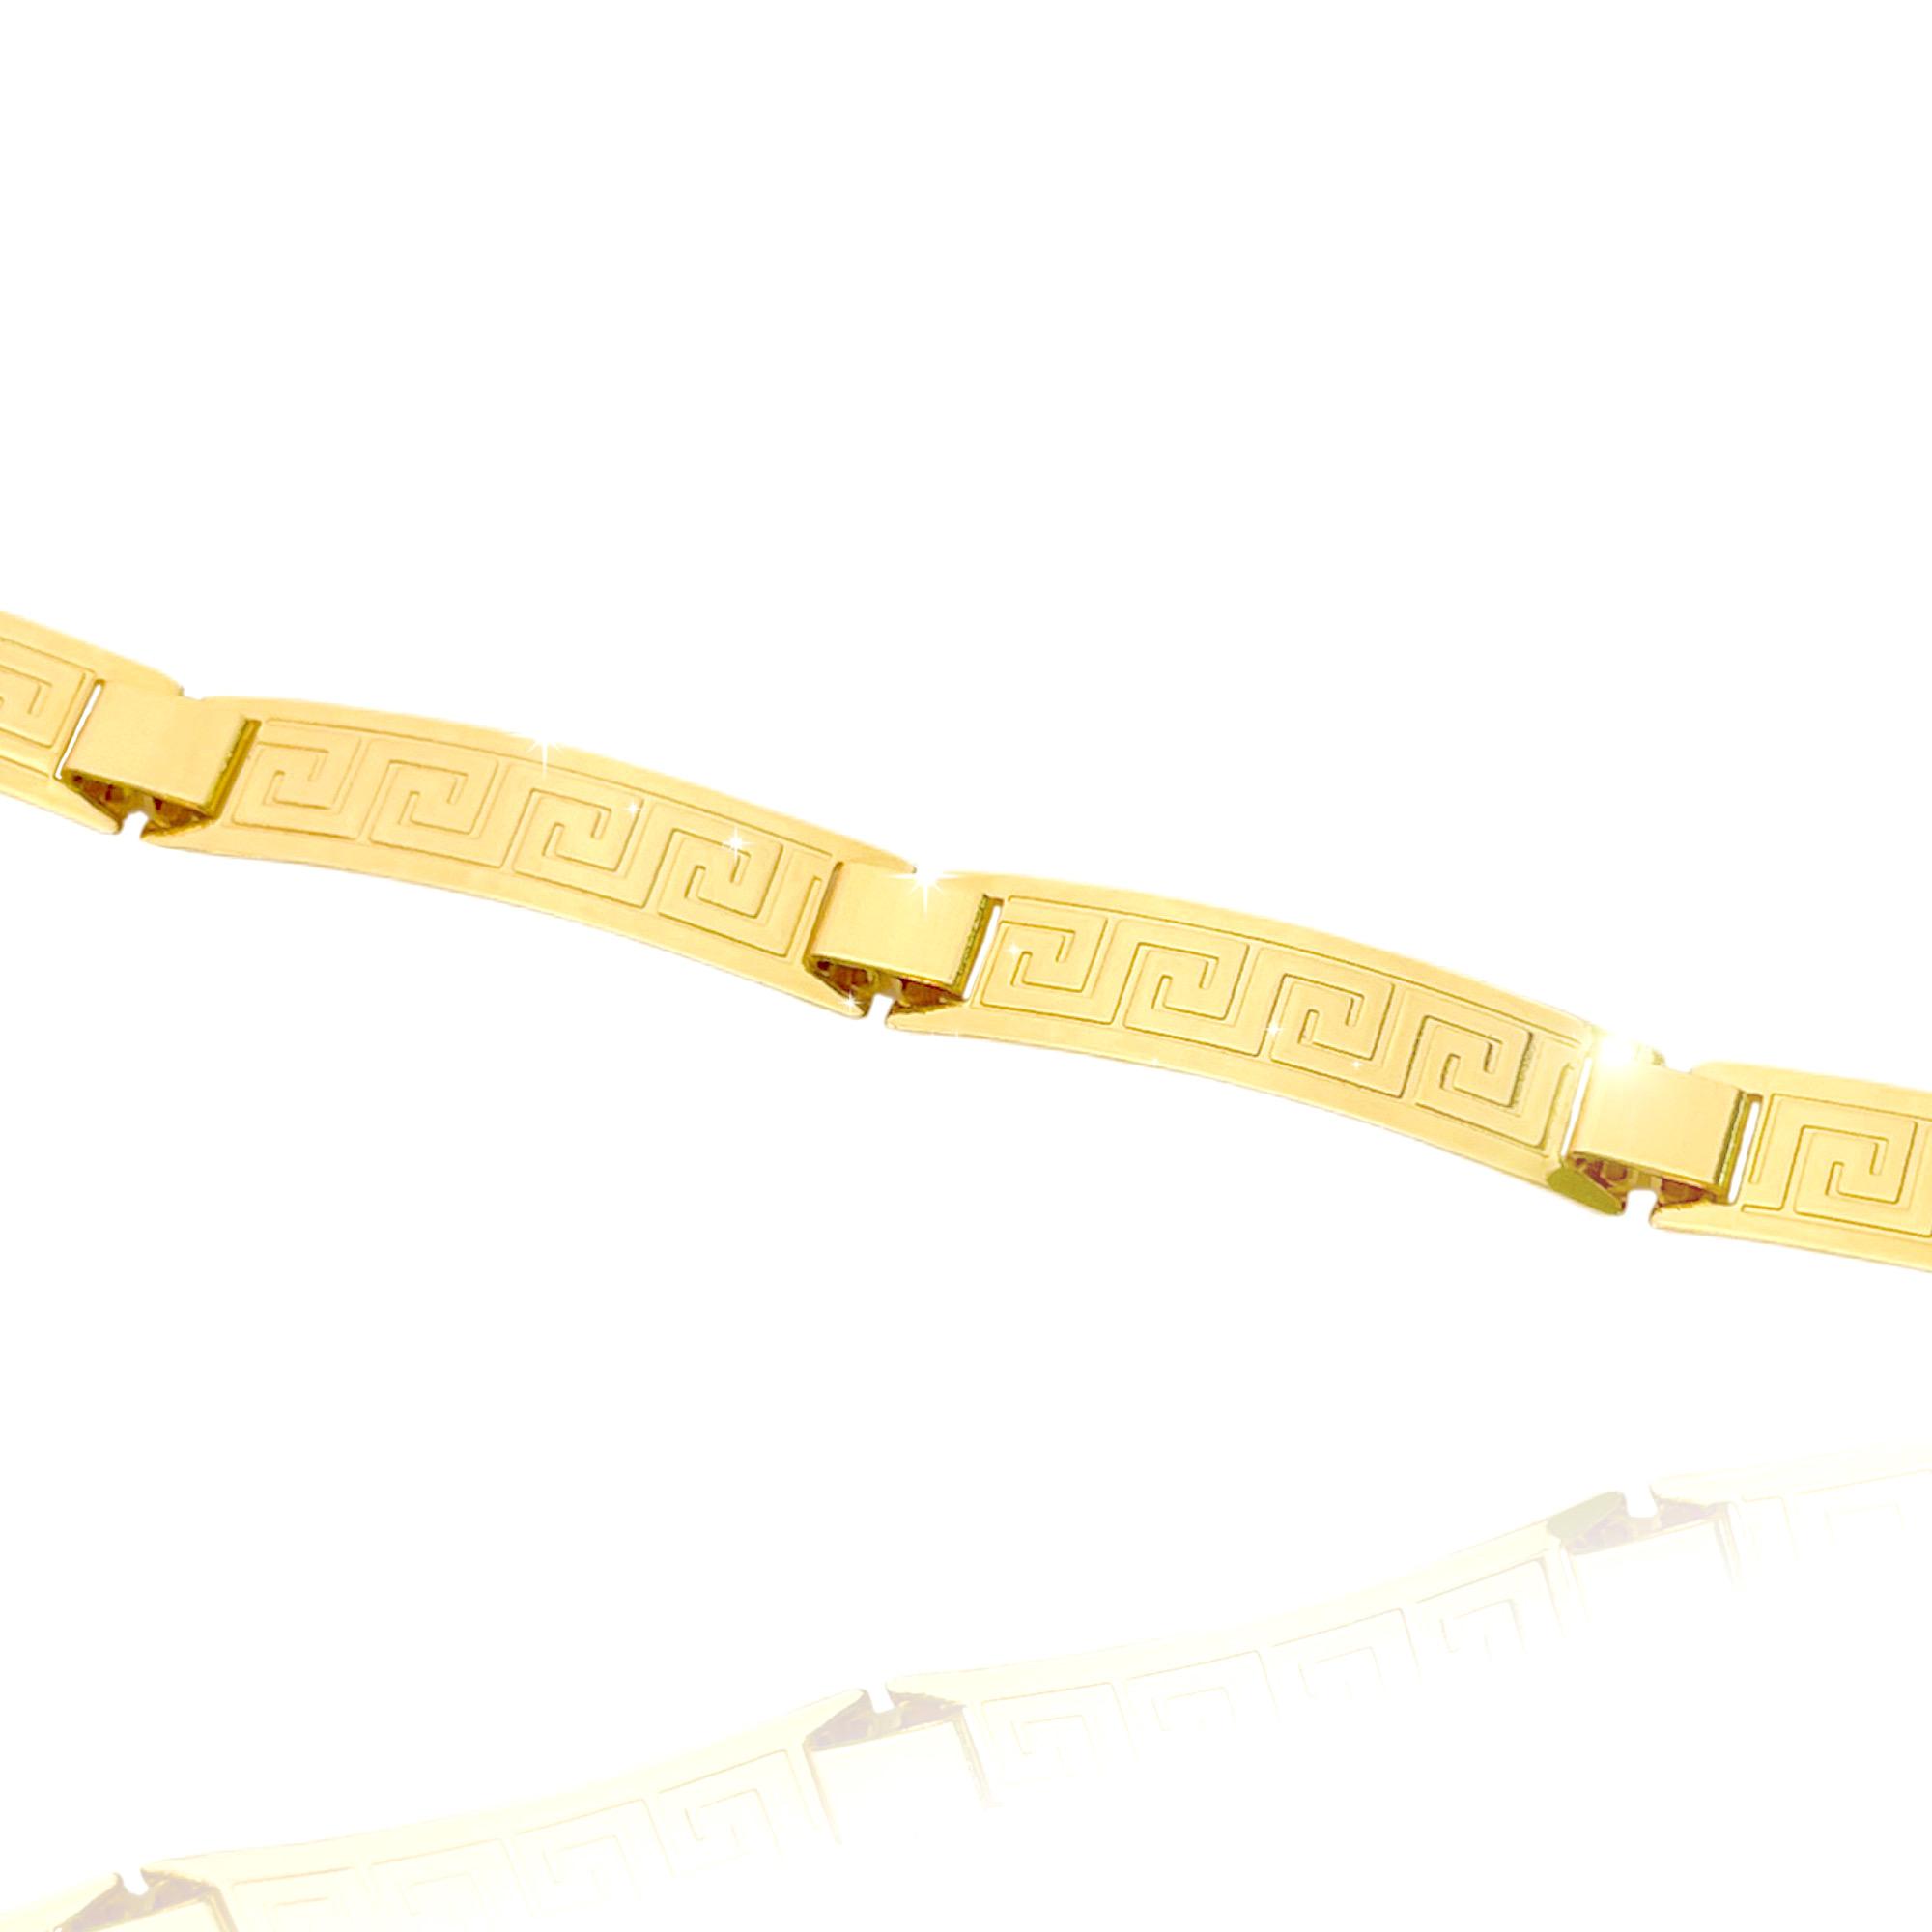 Bracelete Medusa 7mm (10g) (Banho Ouro 24k)